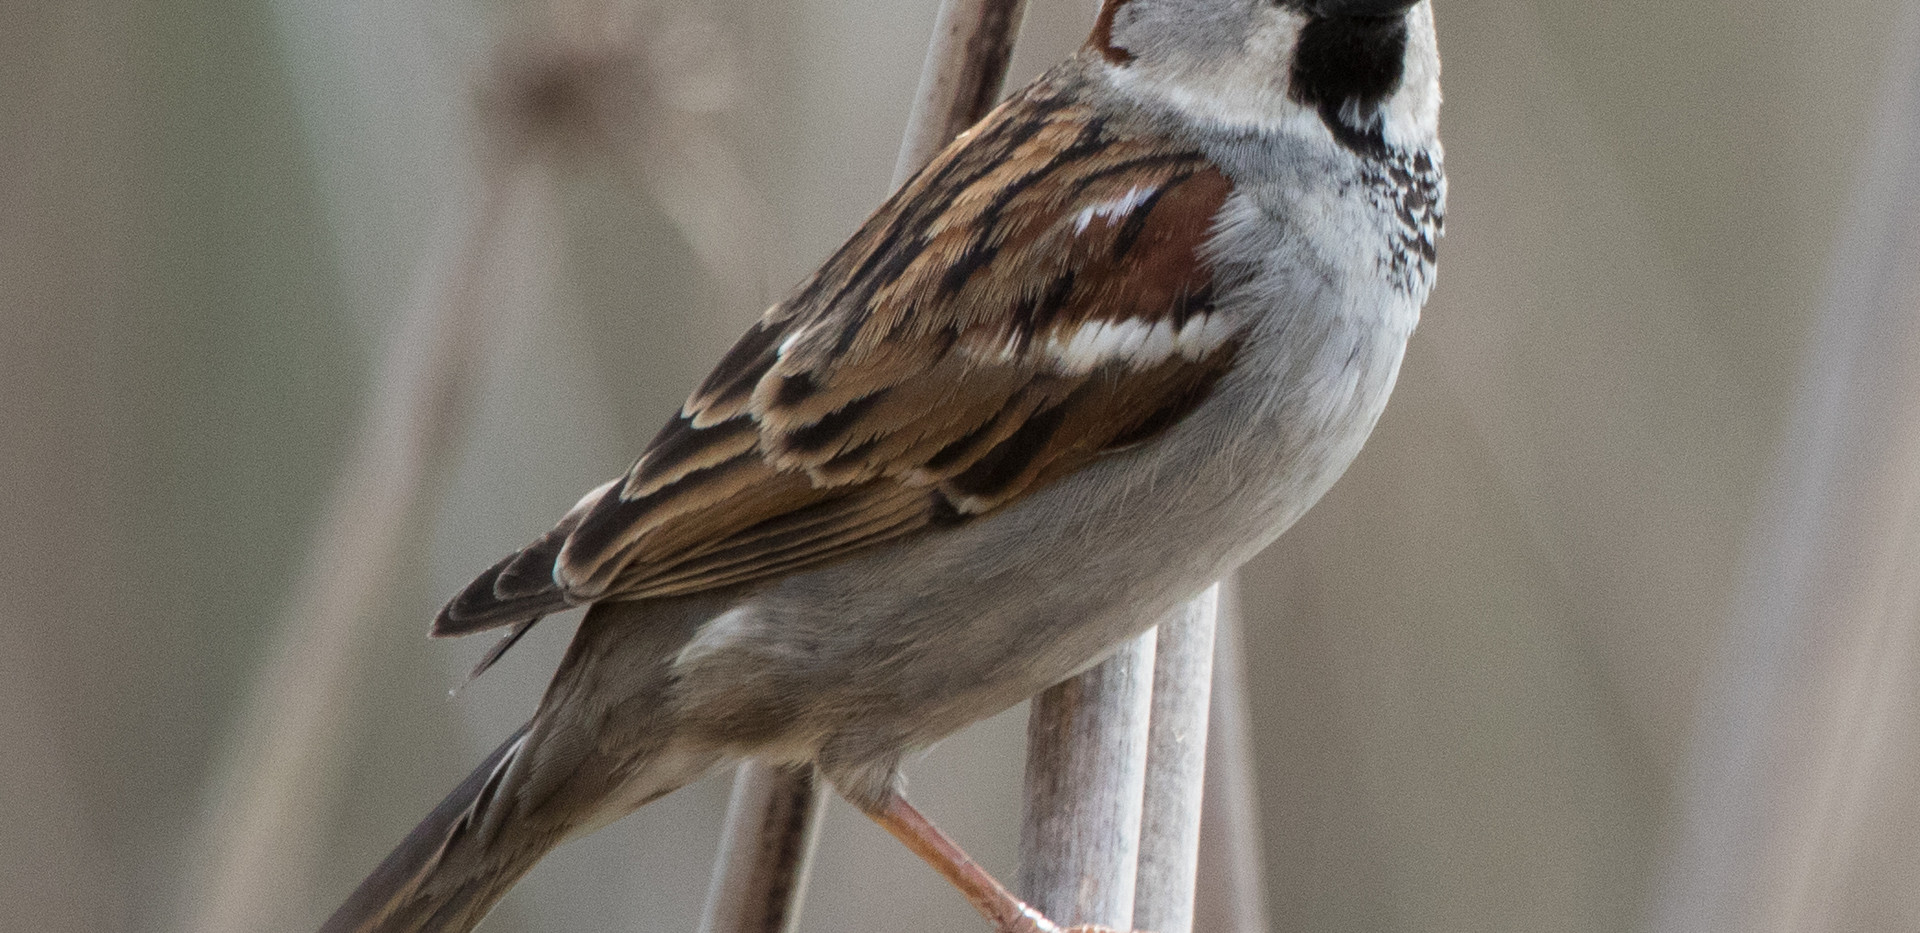 20160228 Sac Wildlife Refuge-3882 bird.j